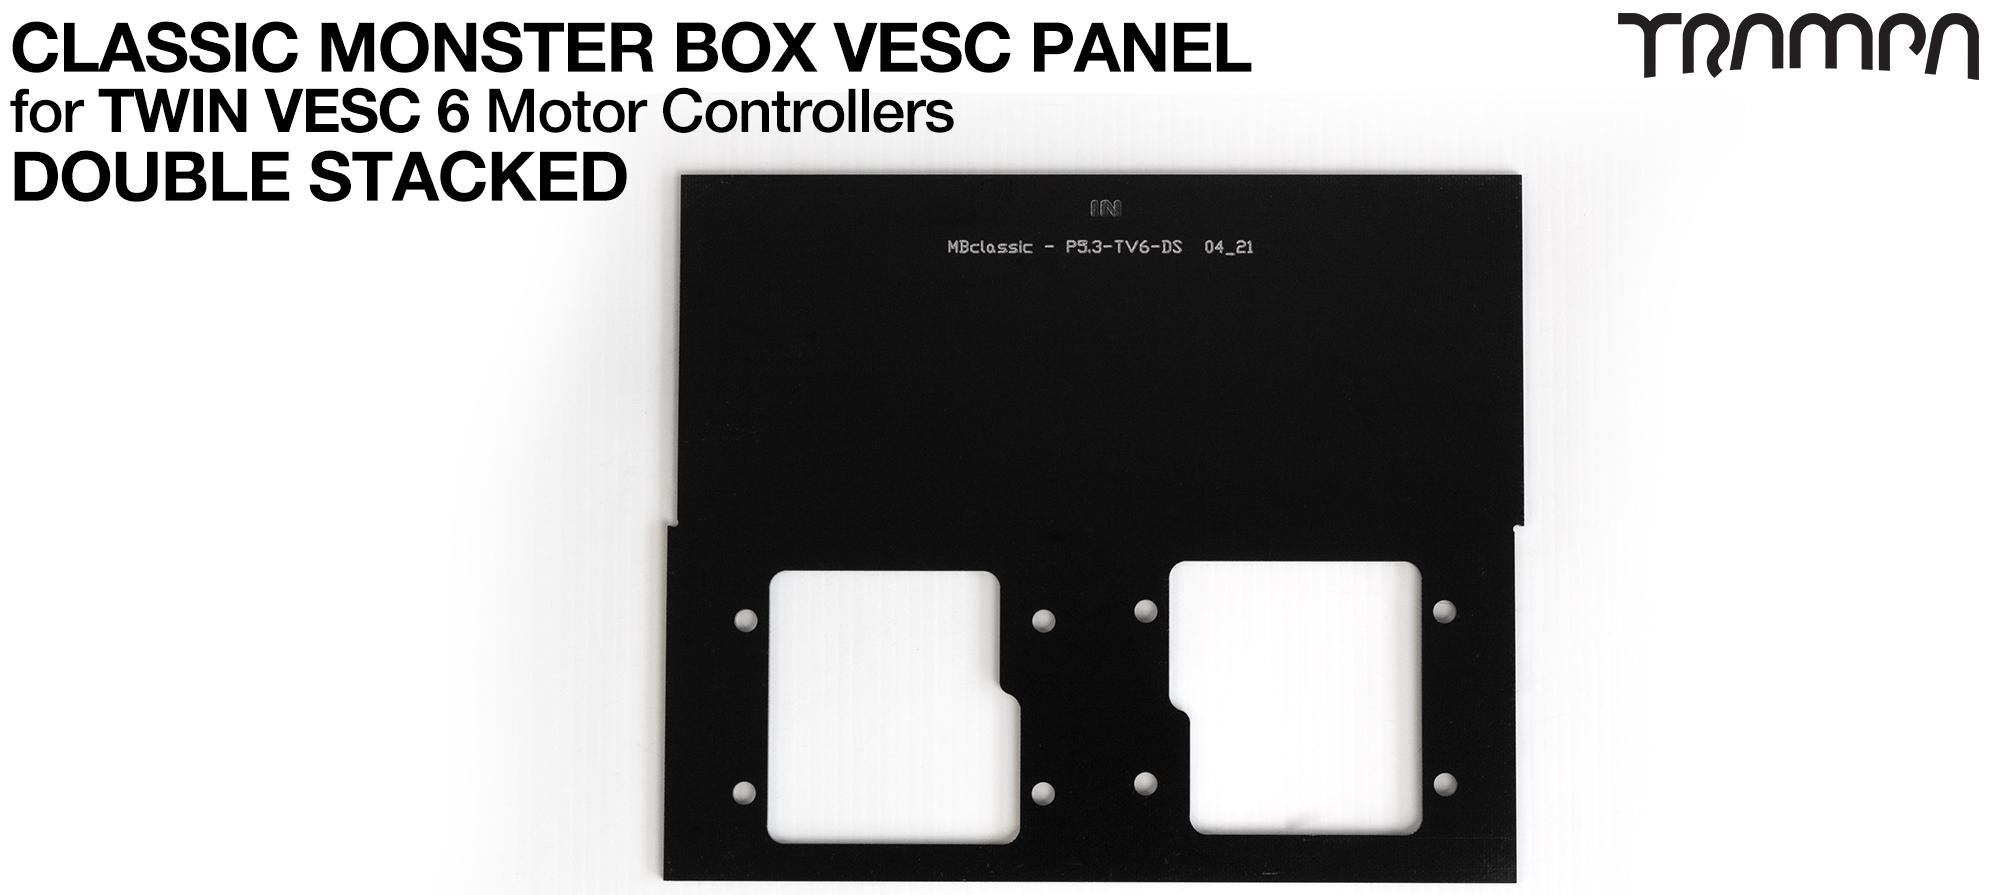 CLASSIC Monster Box MkV DOUBLE STACK Twin VESC 6 PANEL